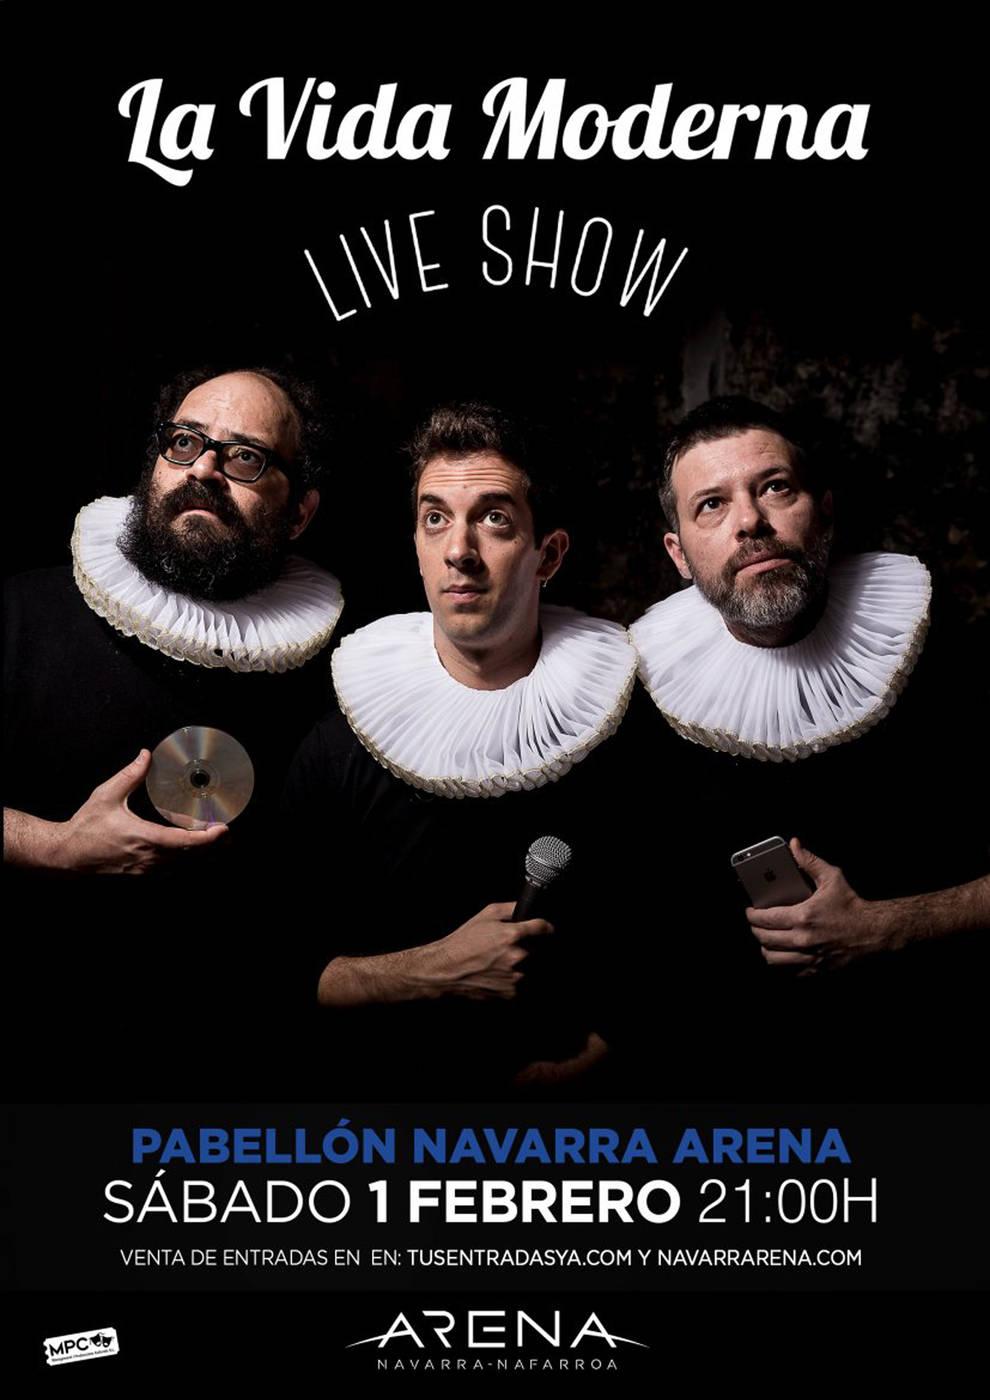 Broncano, Quequé e Ignatius llegan este sábado 1 de febrero al Navarra Arena